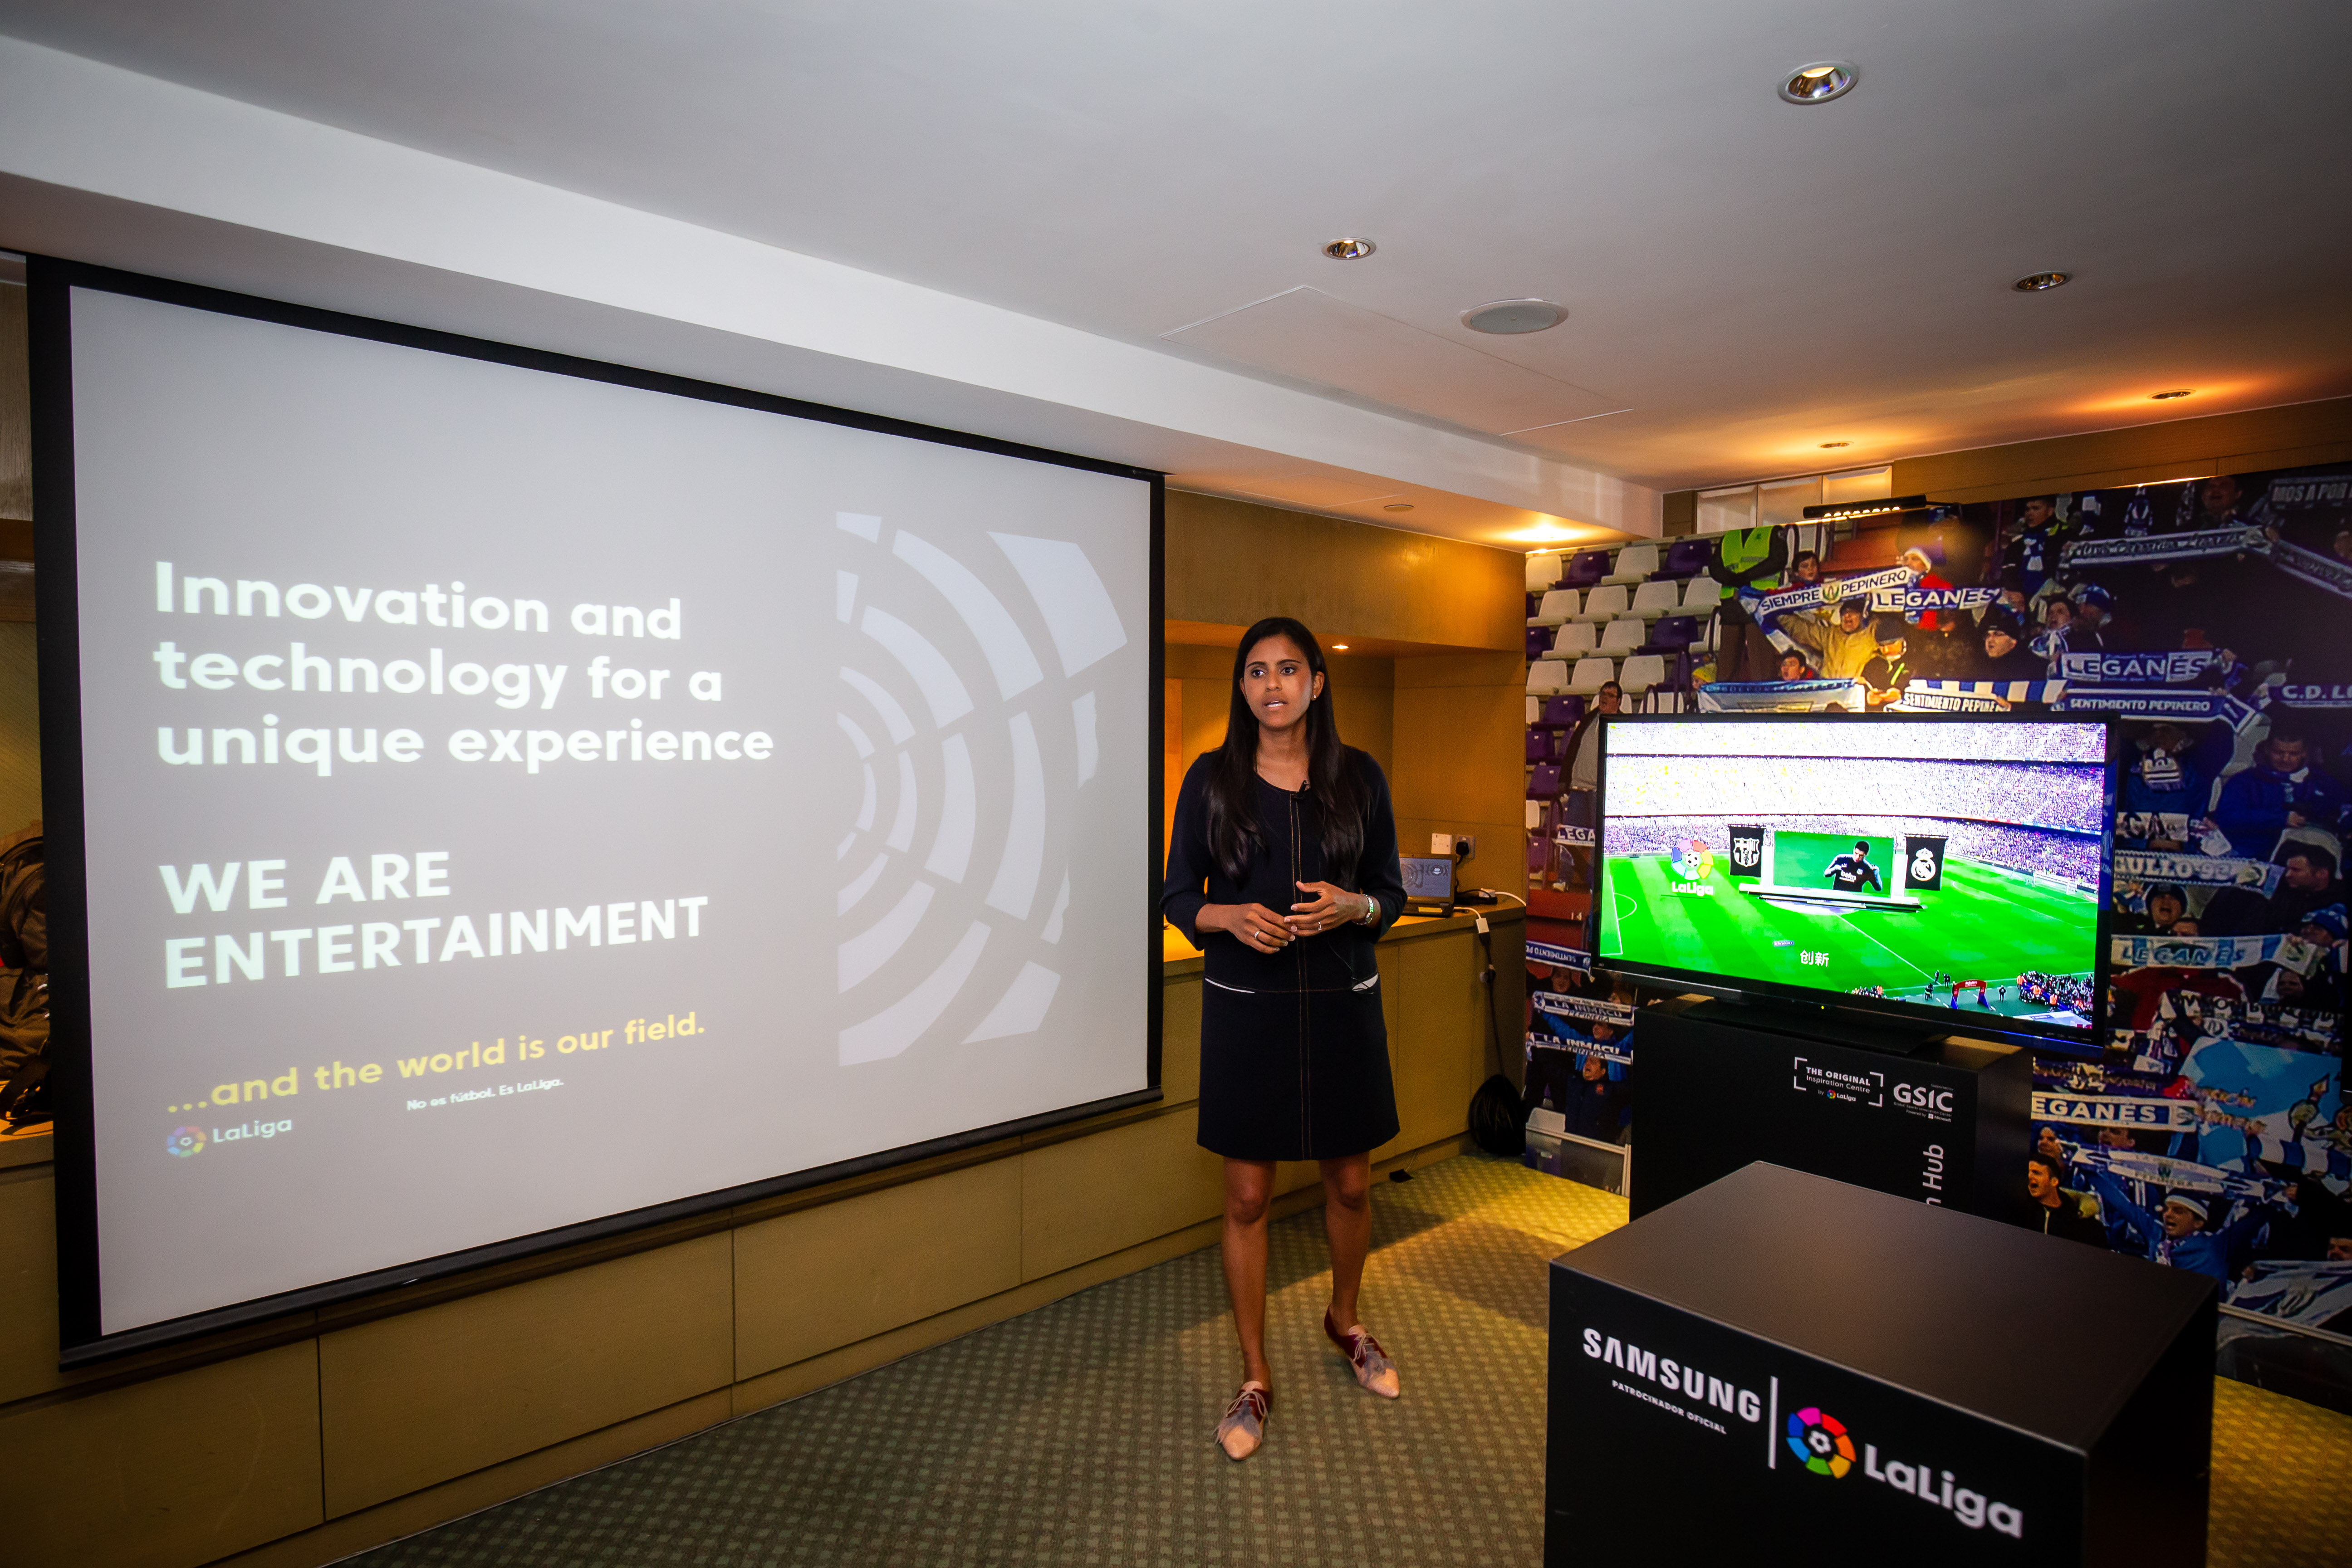 LaLiga Innovation and Global Development Director Minerva Santana during a presentation at RISE 2019 Conference. Source: LaLiga